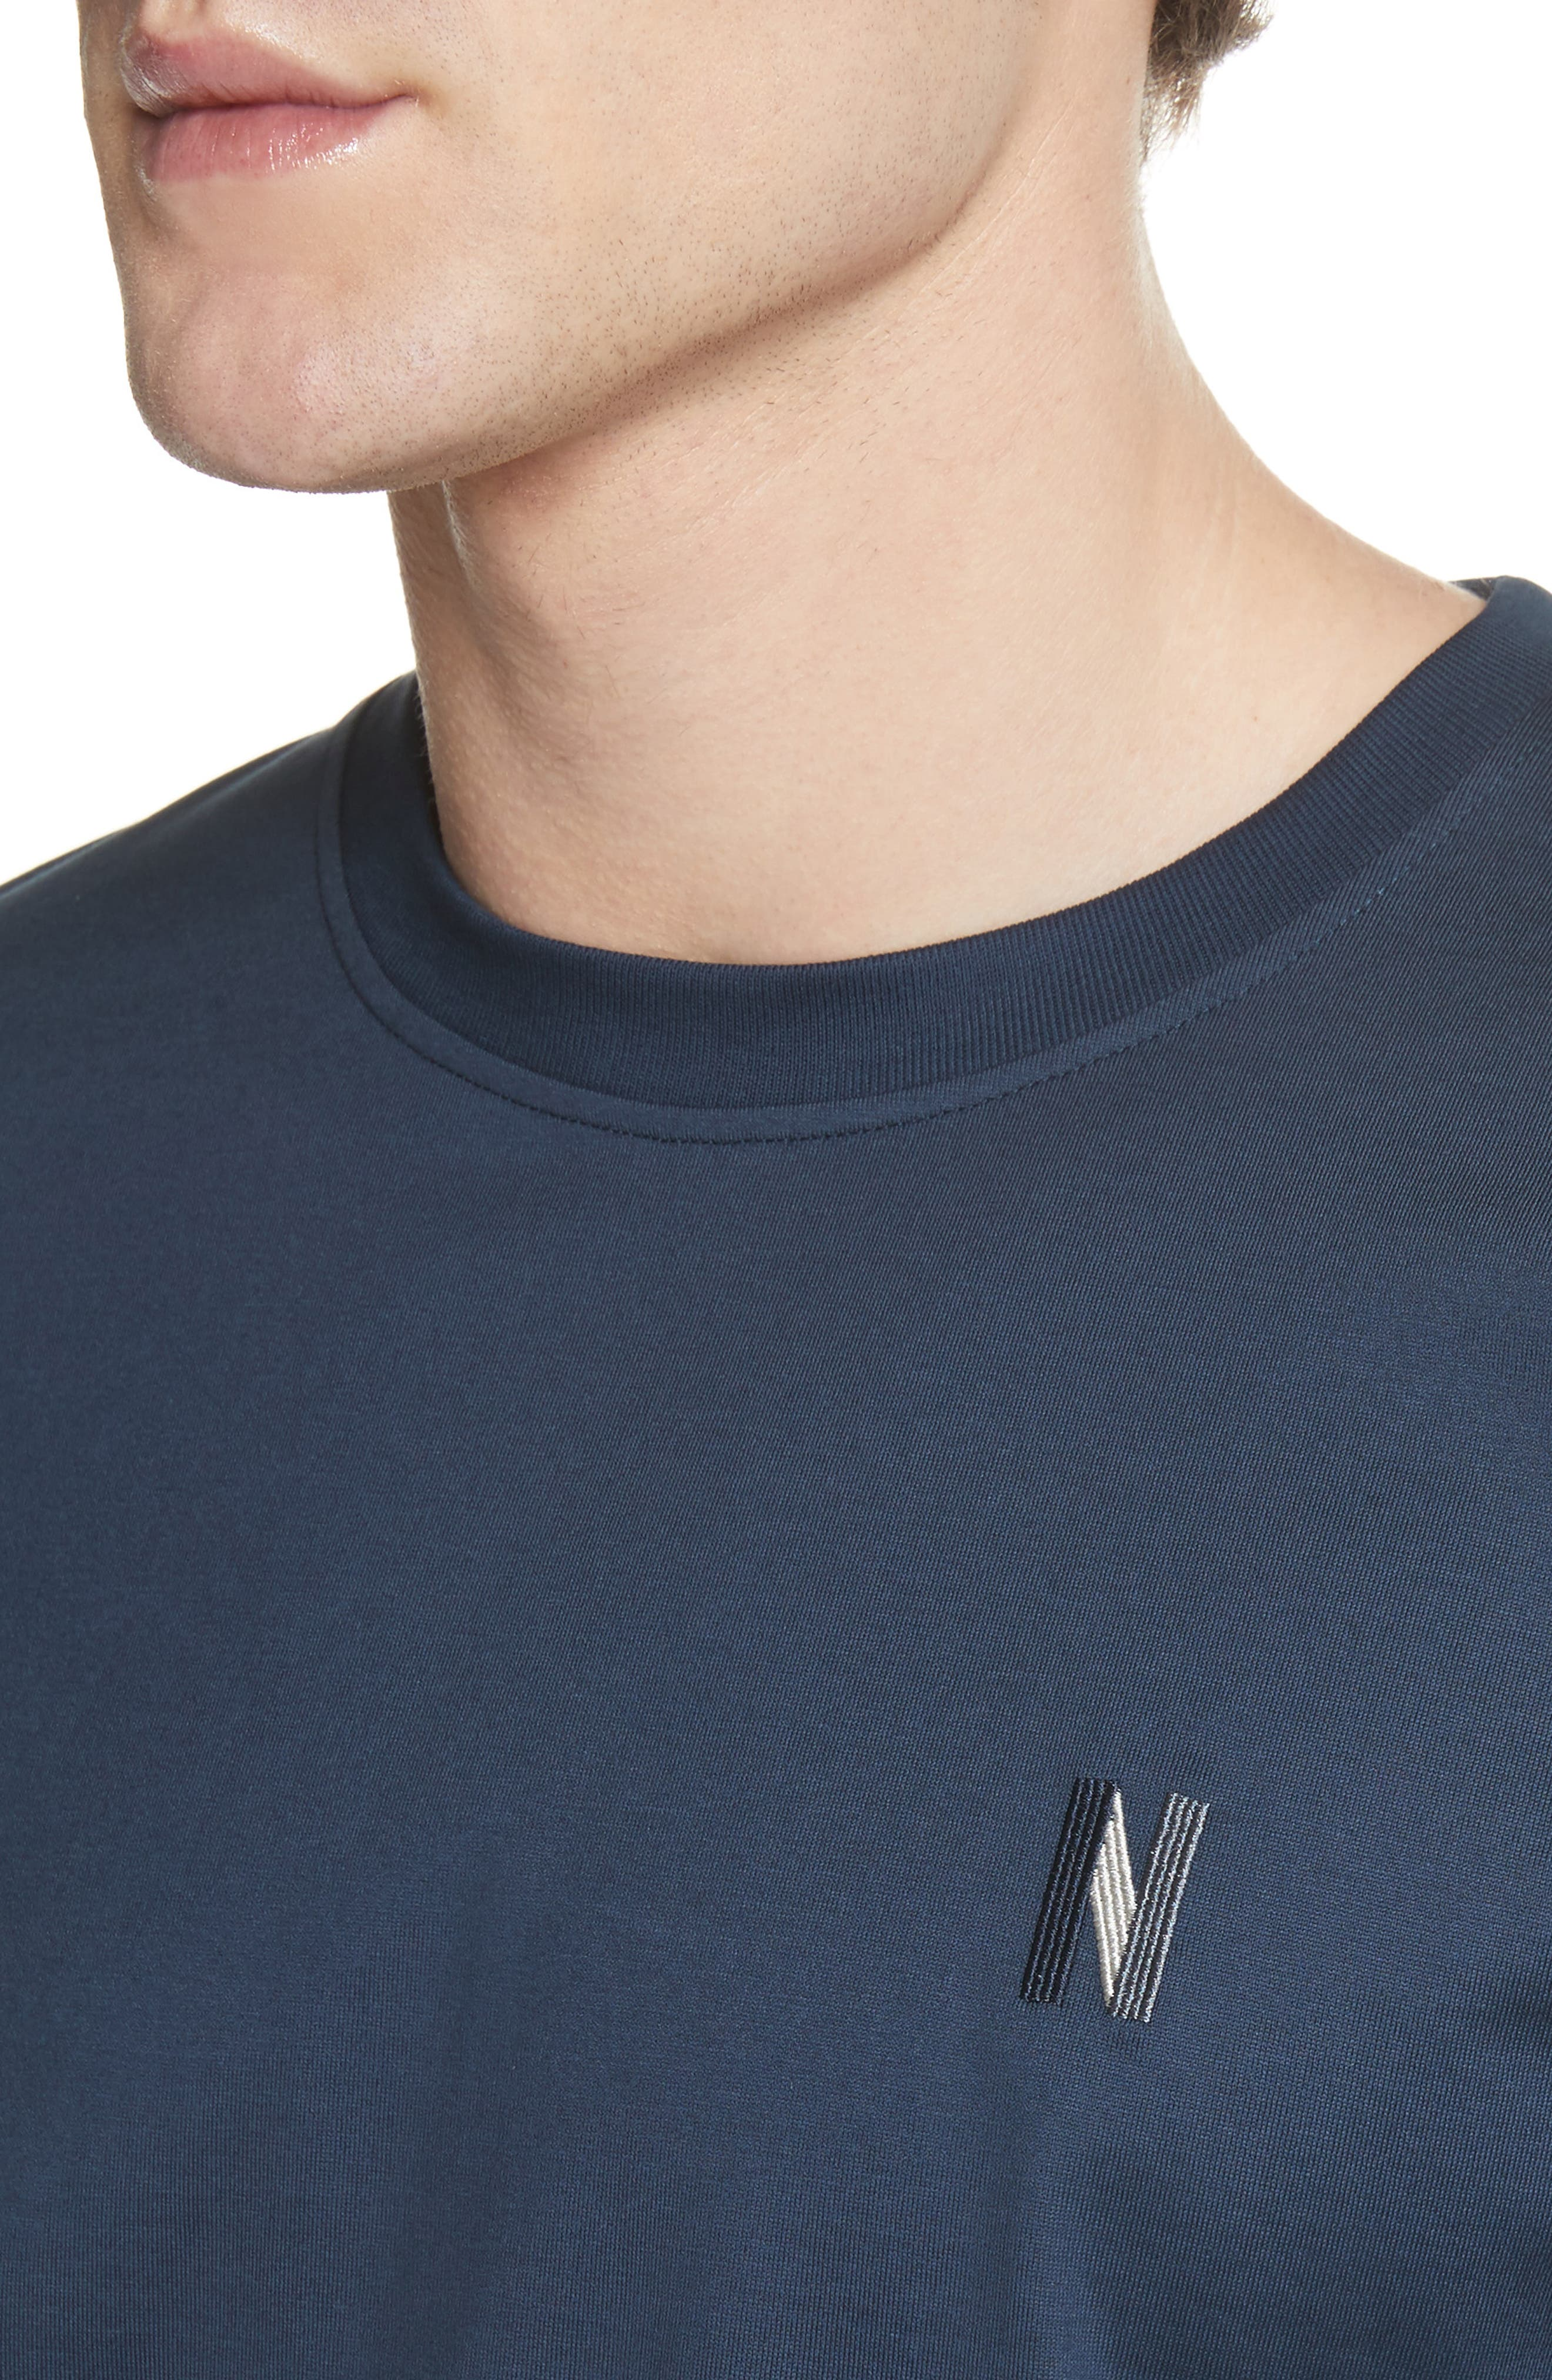 Niels N-Logo T-Shirt,                             Alternate thumbnail 4, color,